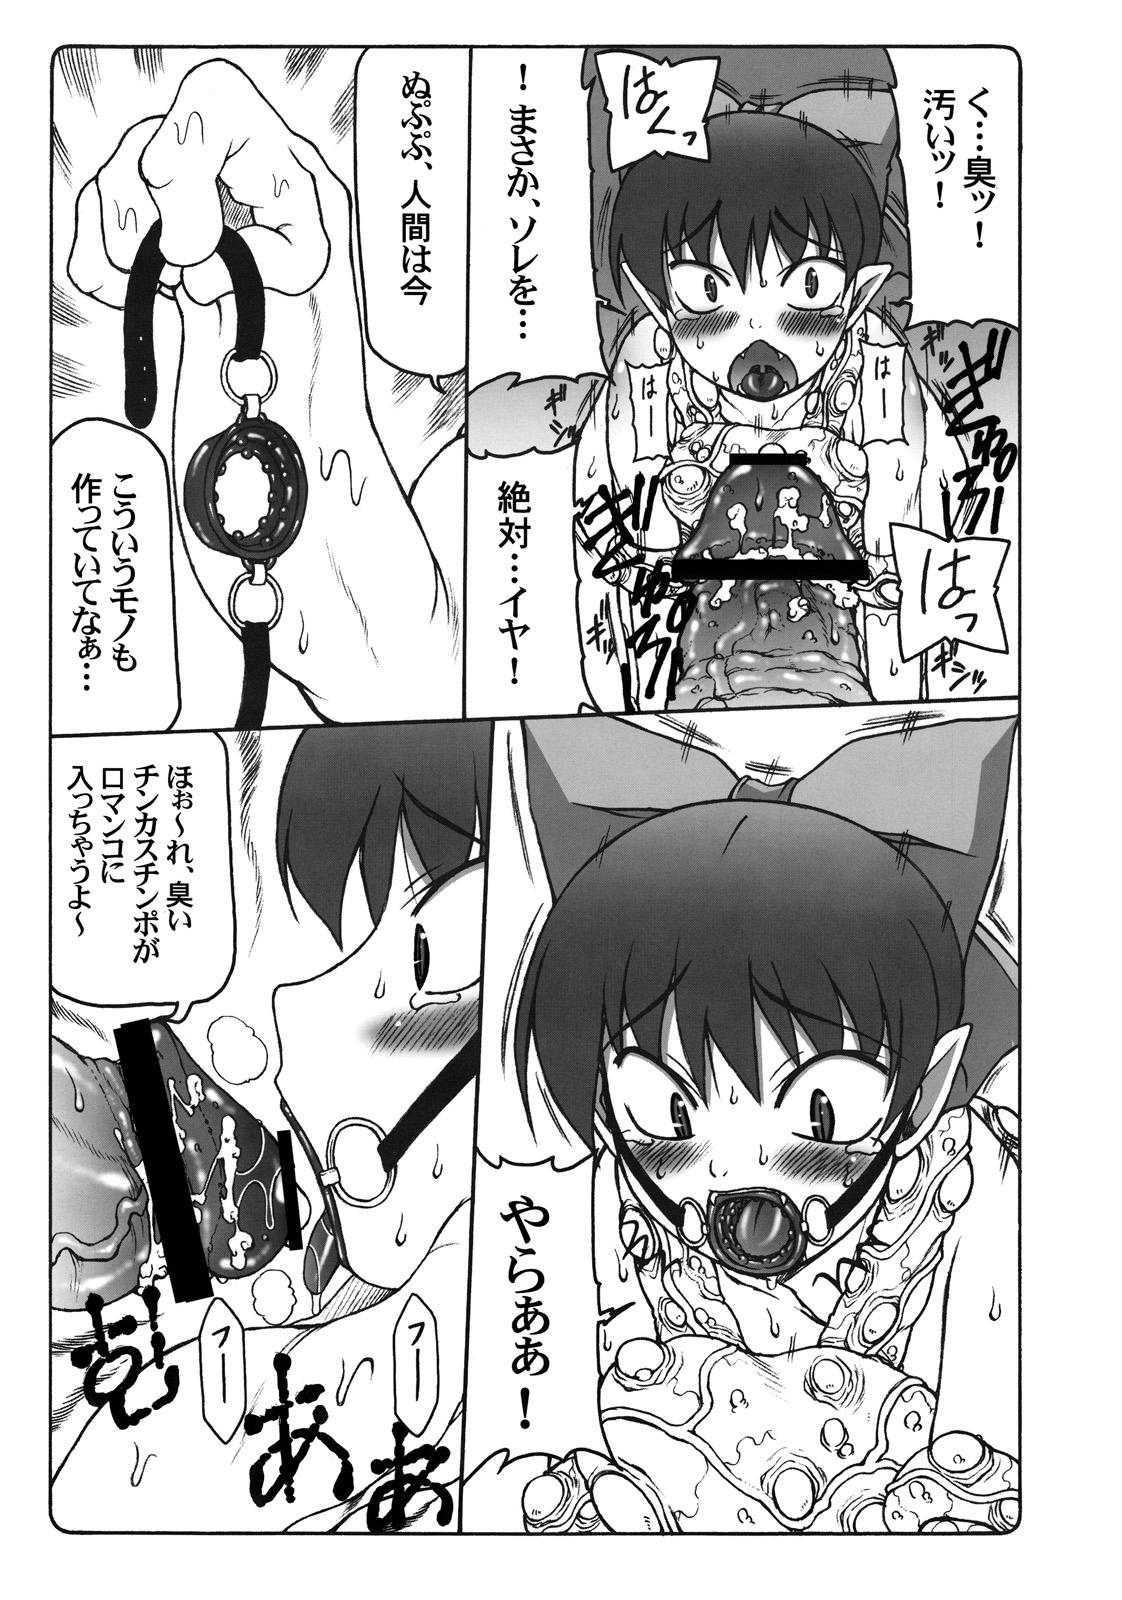 Nuko Musume VS Youkai Nuppuppou 11